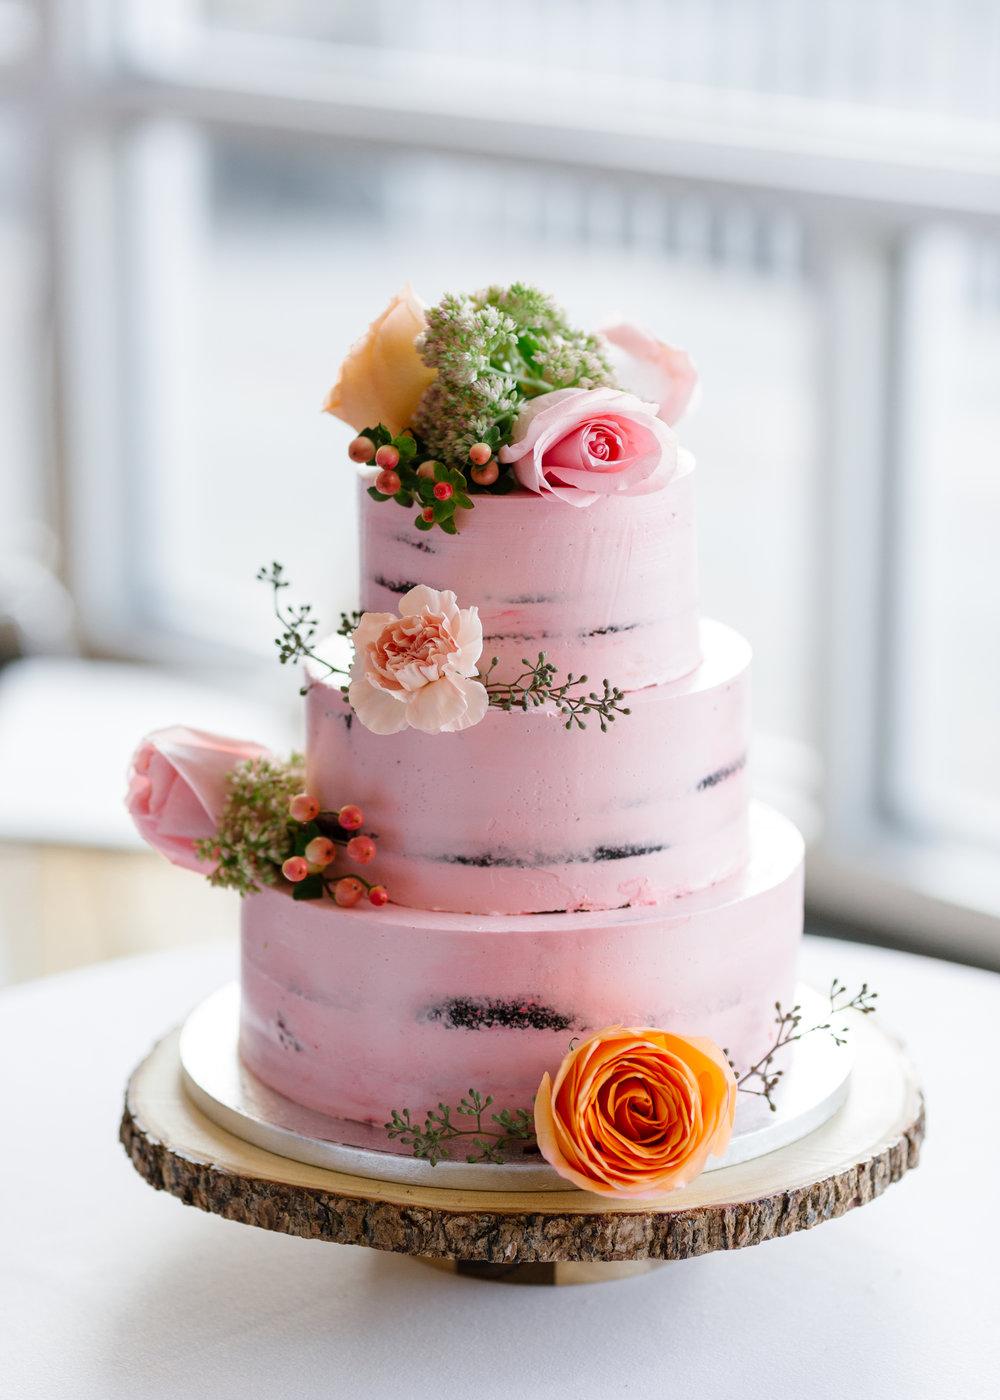 herastudios_wedding_julie_jason_hera_selects-82.jpg